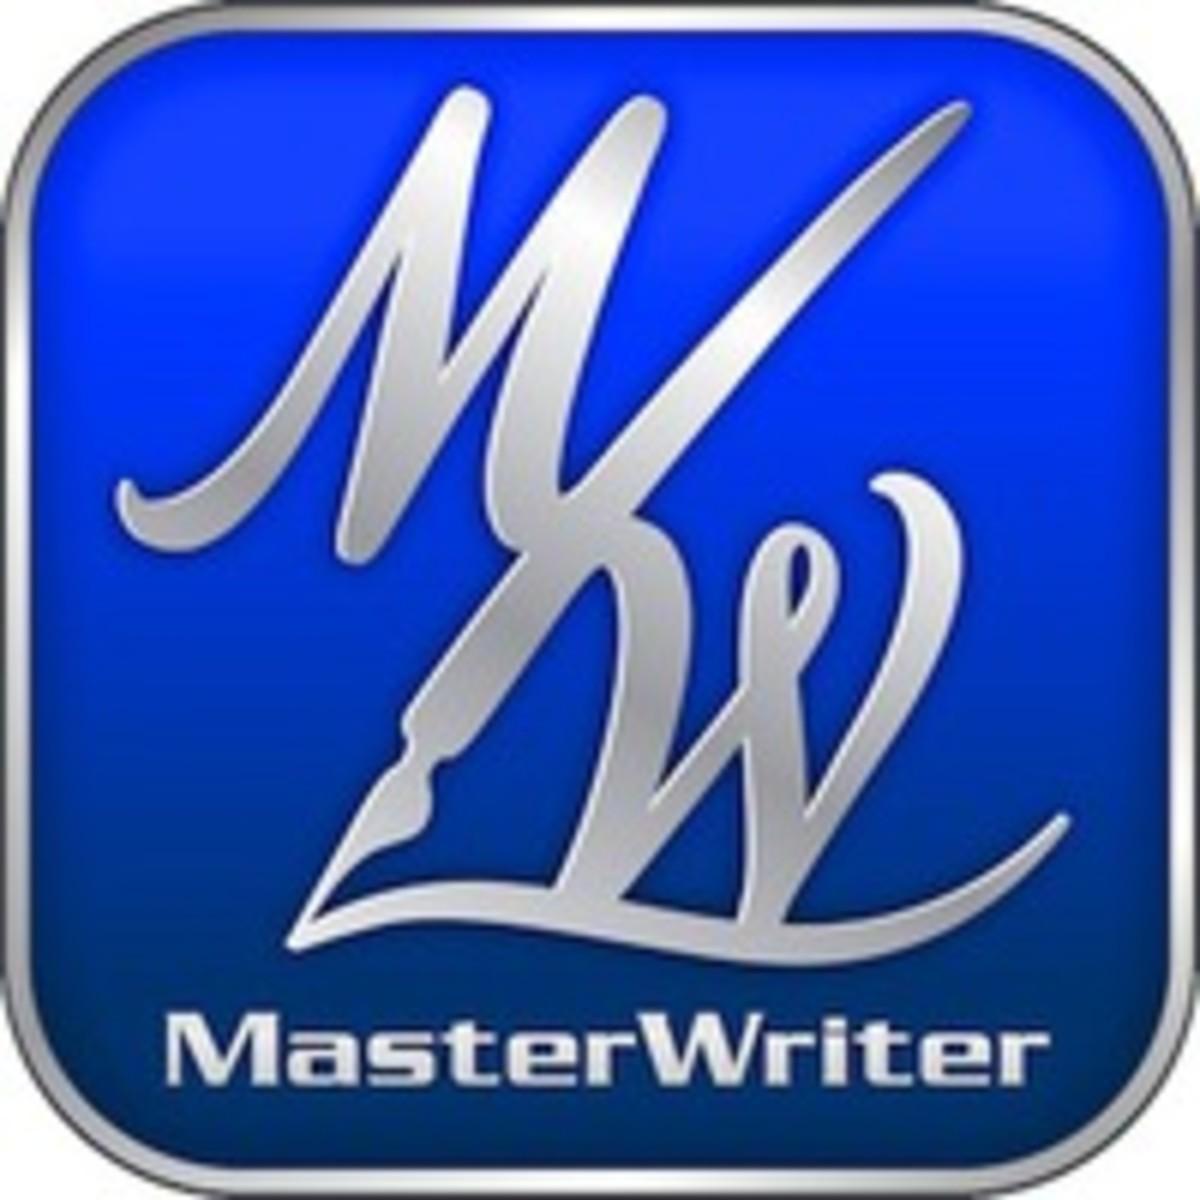 MW_Square Logo_3D